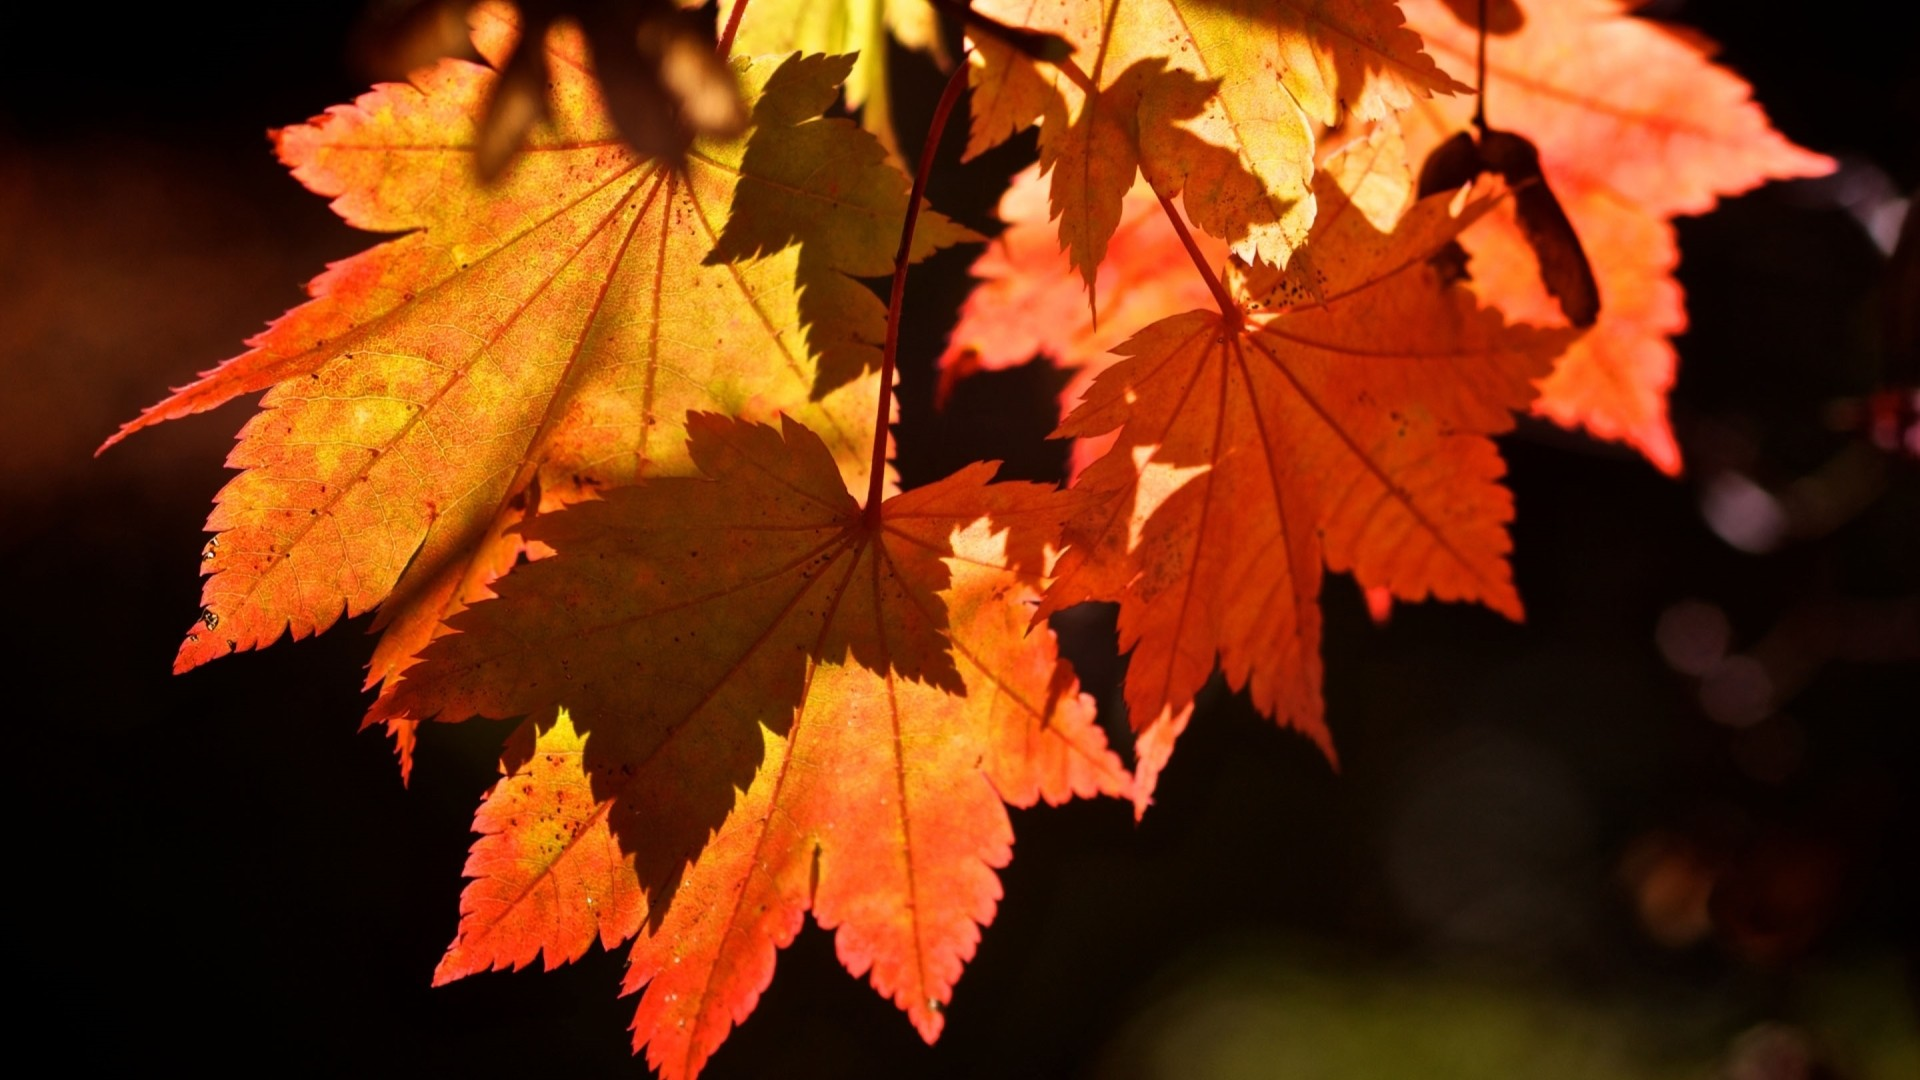 Fall Leaves HD Wallpaper